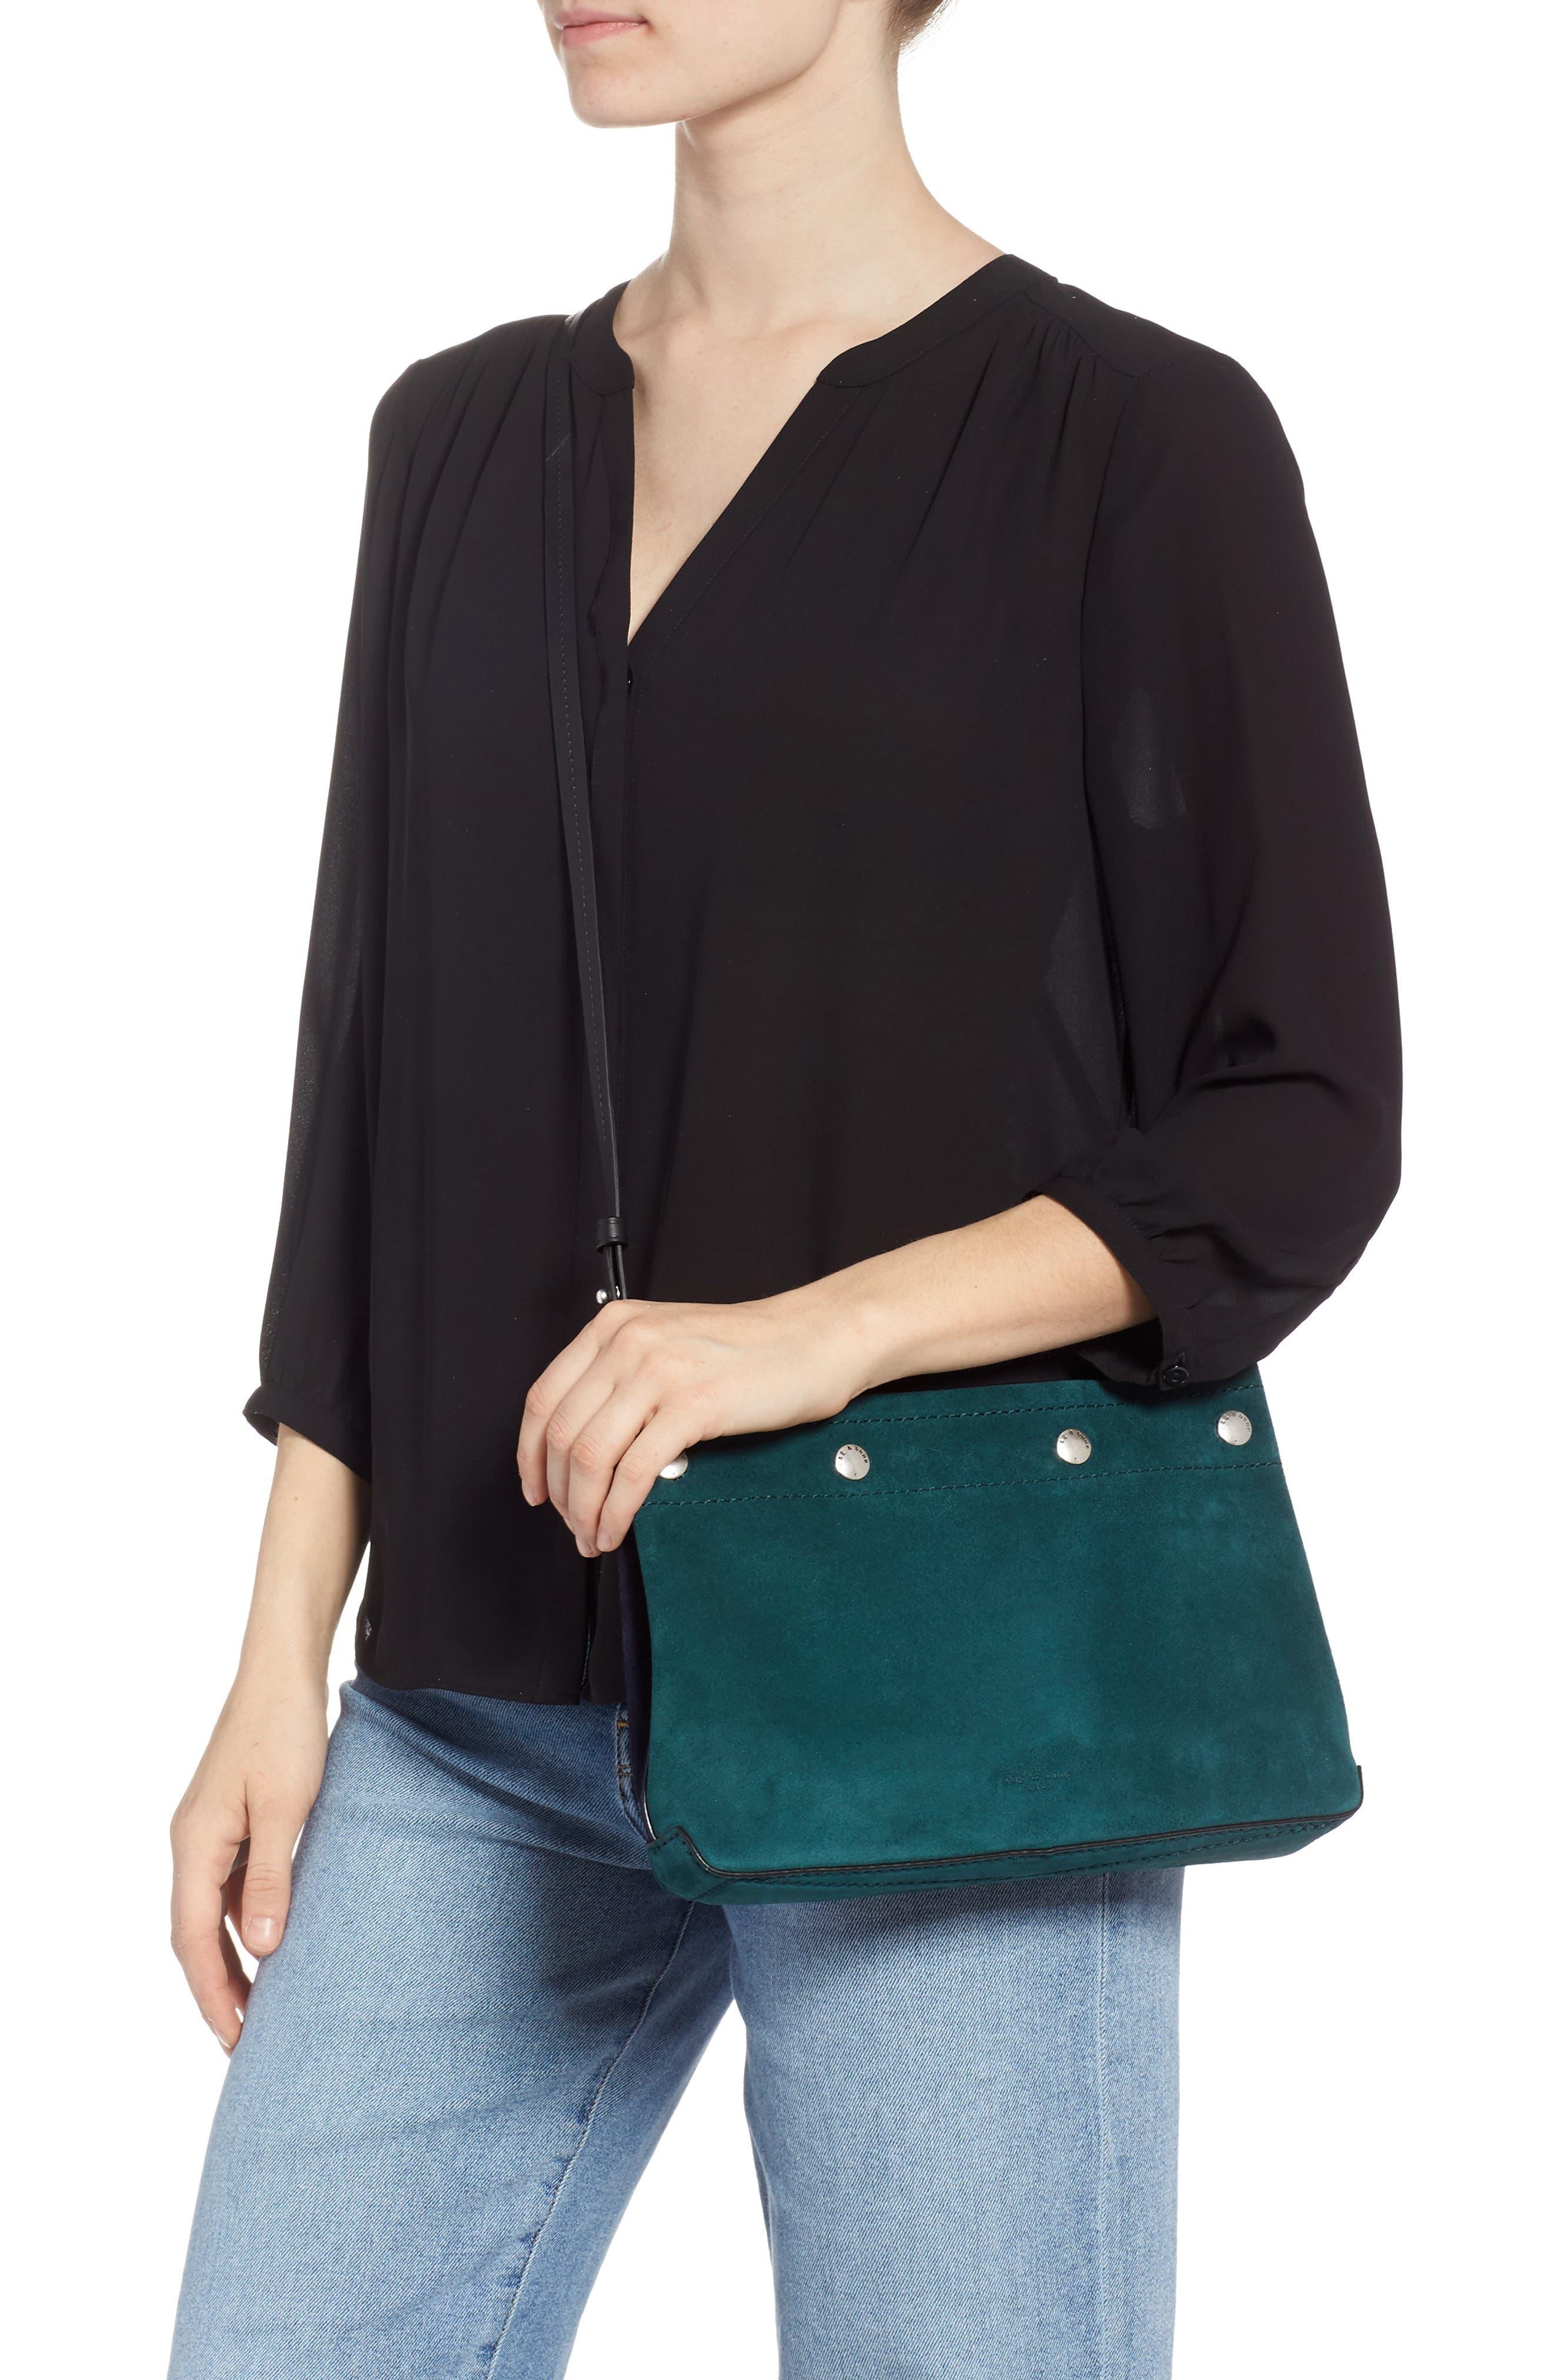 RAG & BONE,                             Compass Colorblock Leather Crossbody Bag,                             Alternate thumbnail 2, color,                             FOREST MULTI